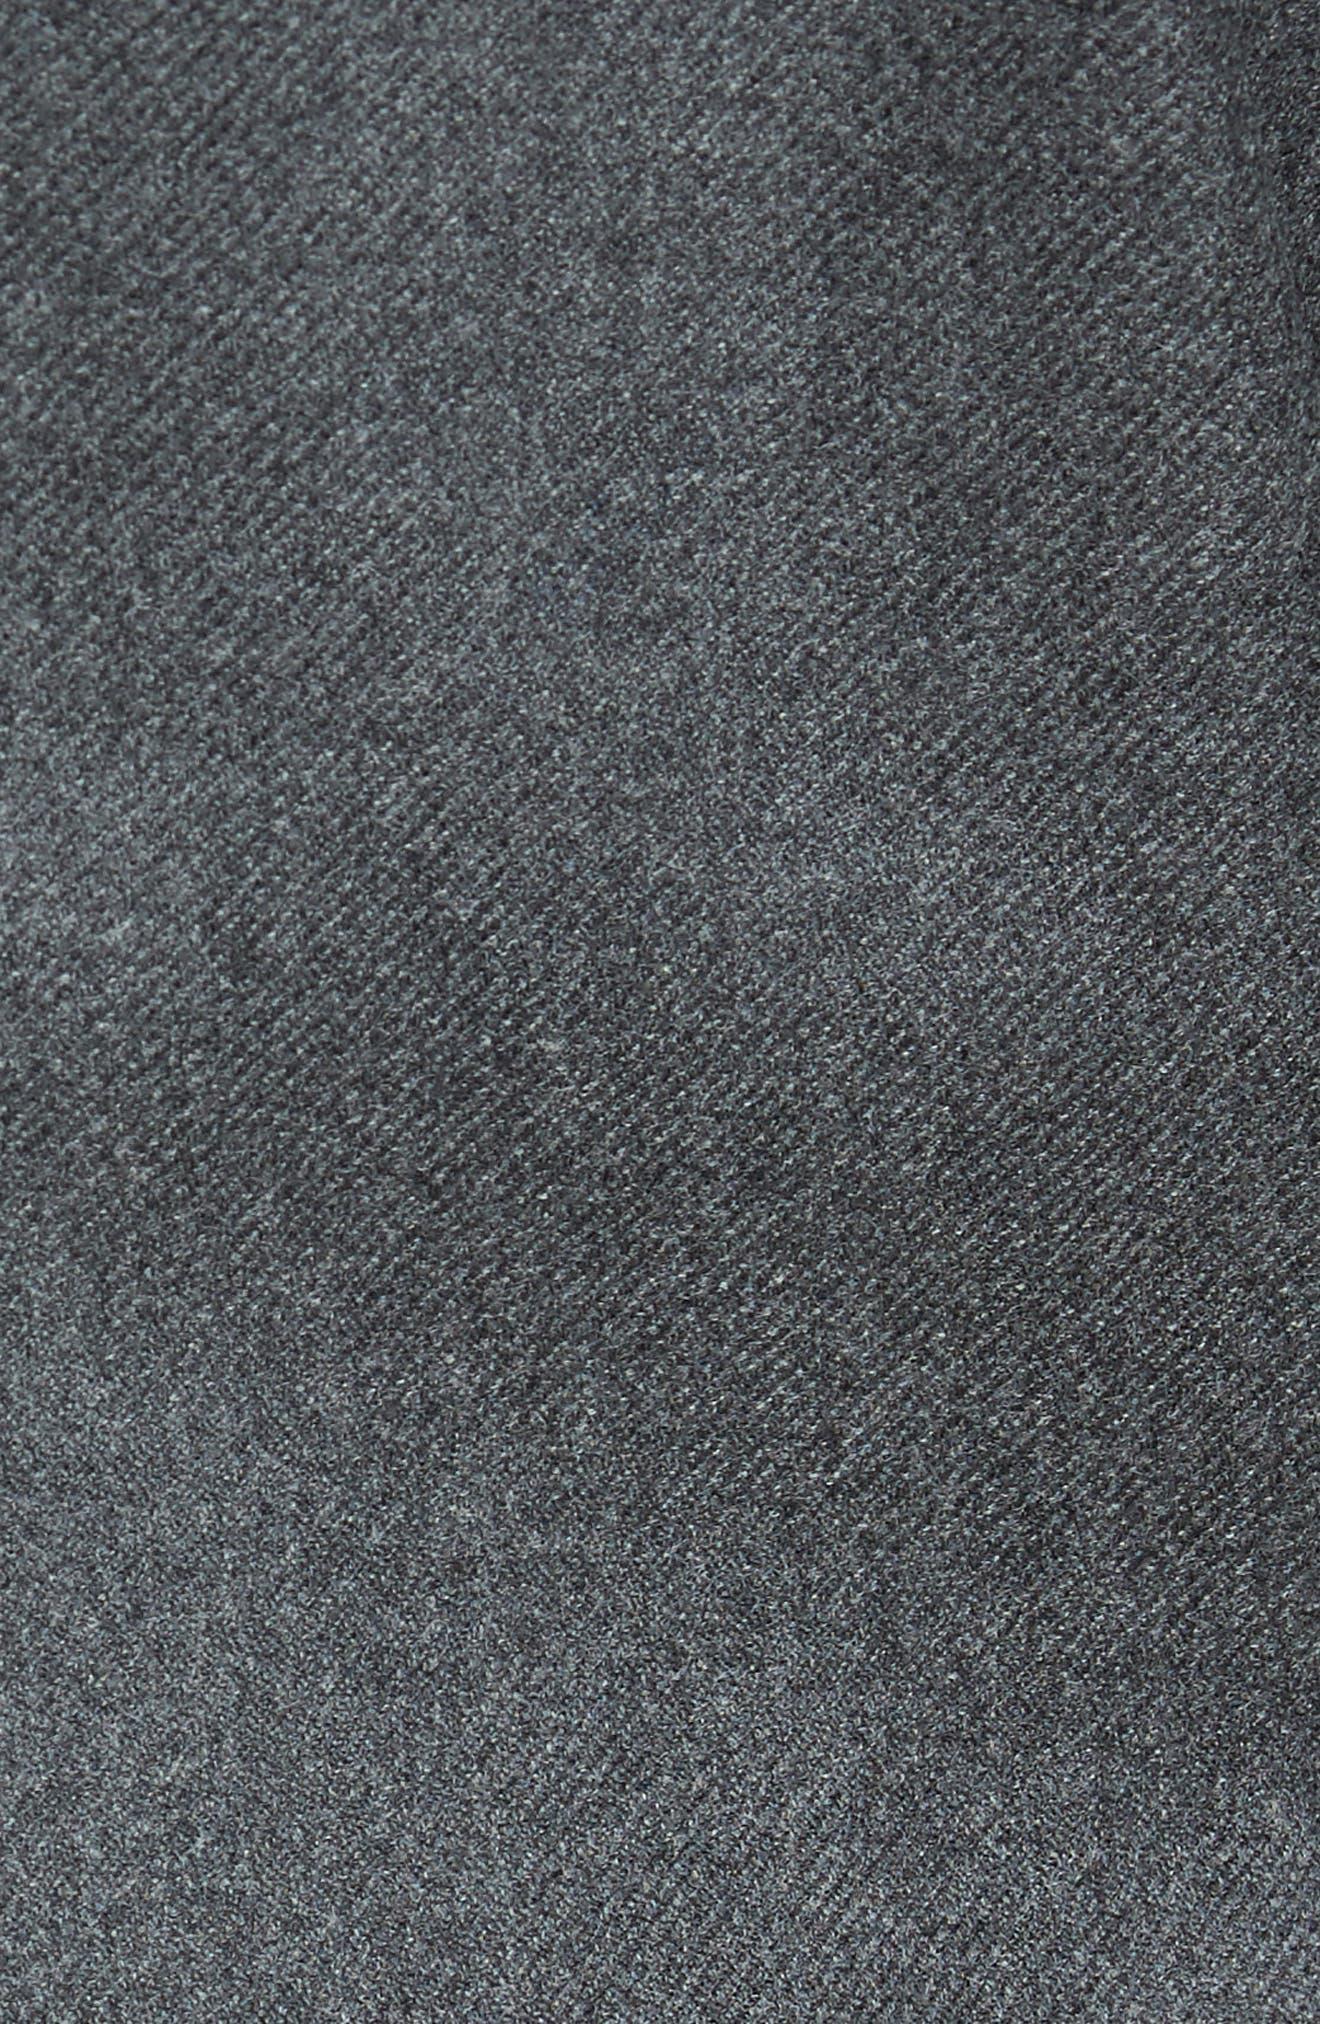 Loro Piana Storm System Shirt Jacket,                             Alternate thumbnail 27, color,